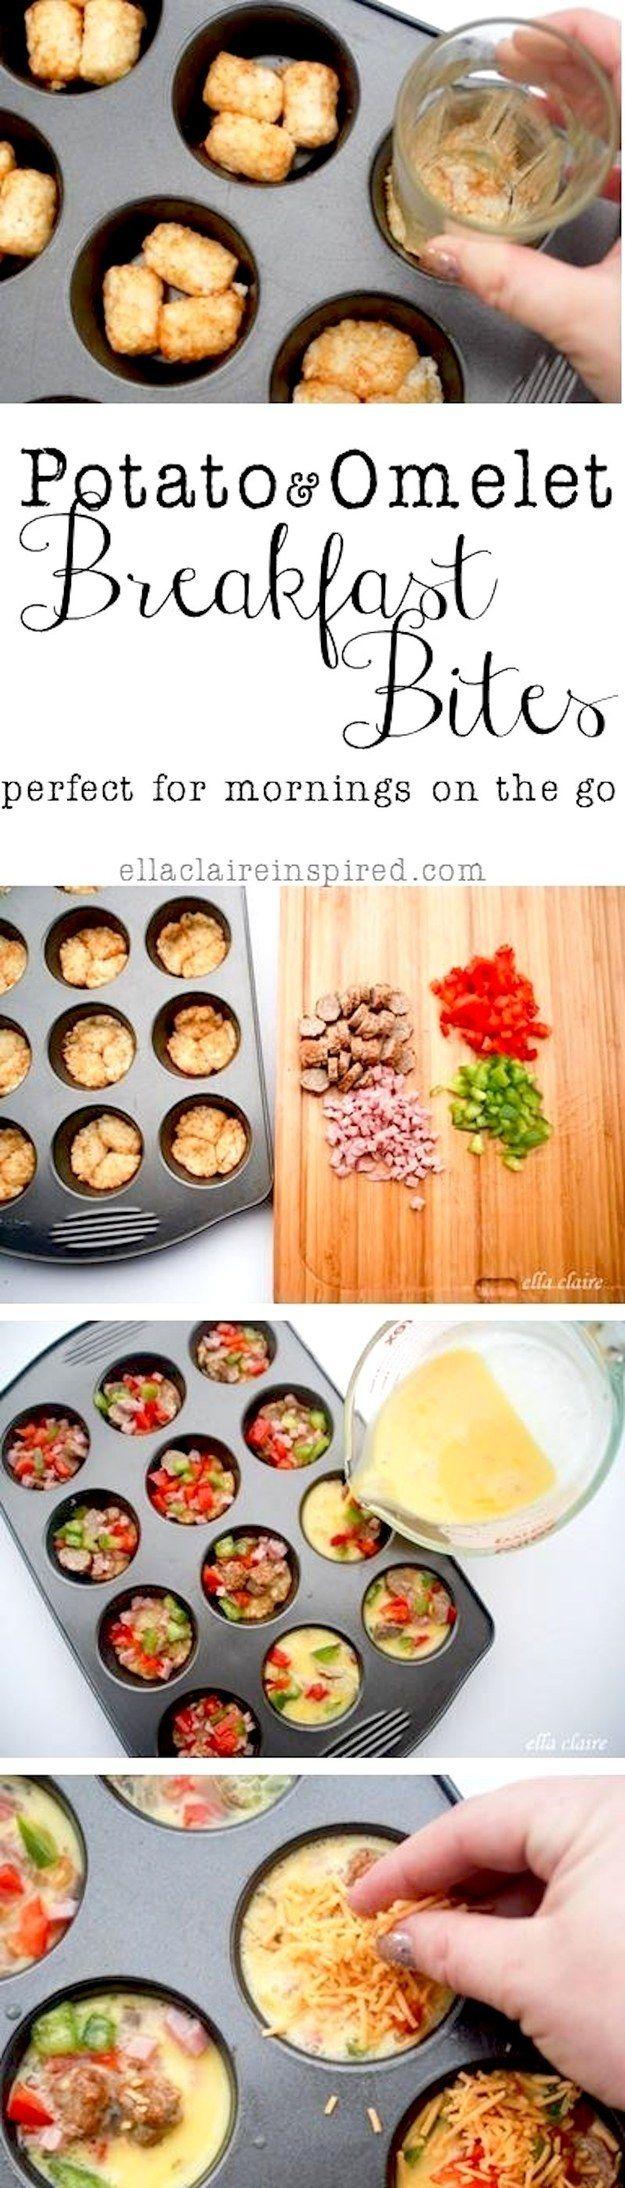 Potato & Omelet Breakfast Bites | 21 Back-To-School Breakfast Recipes That Kids Will Love